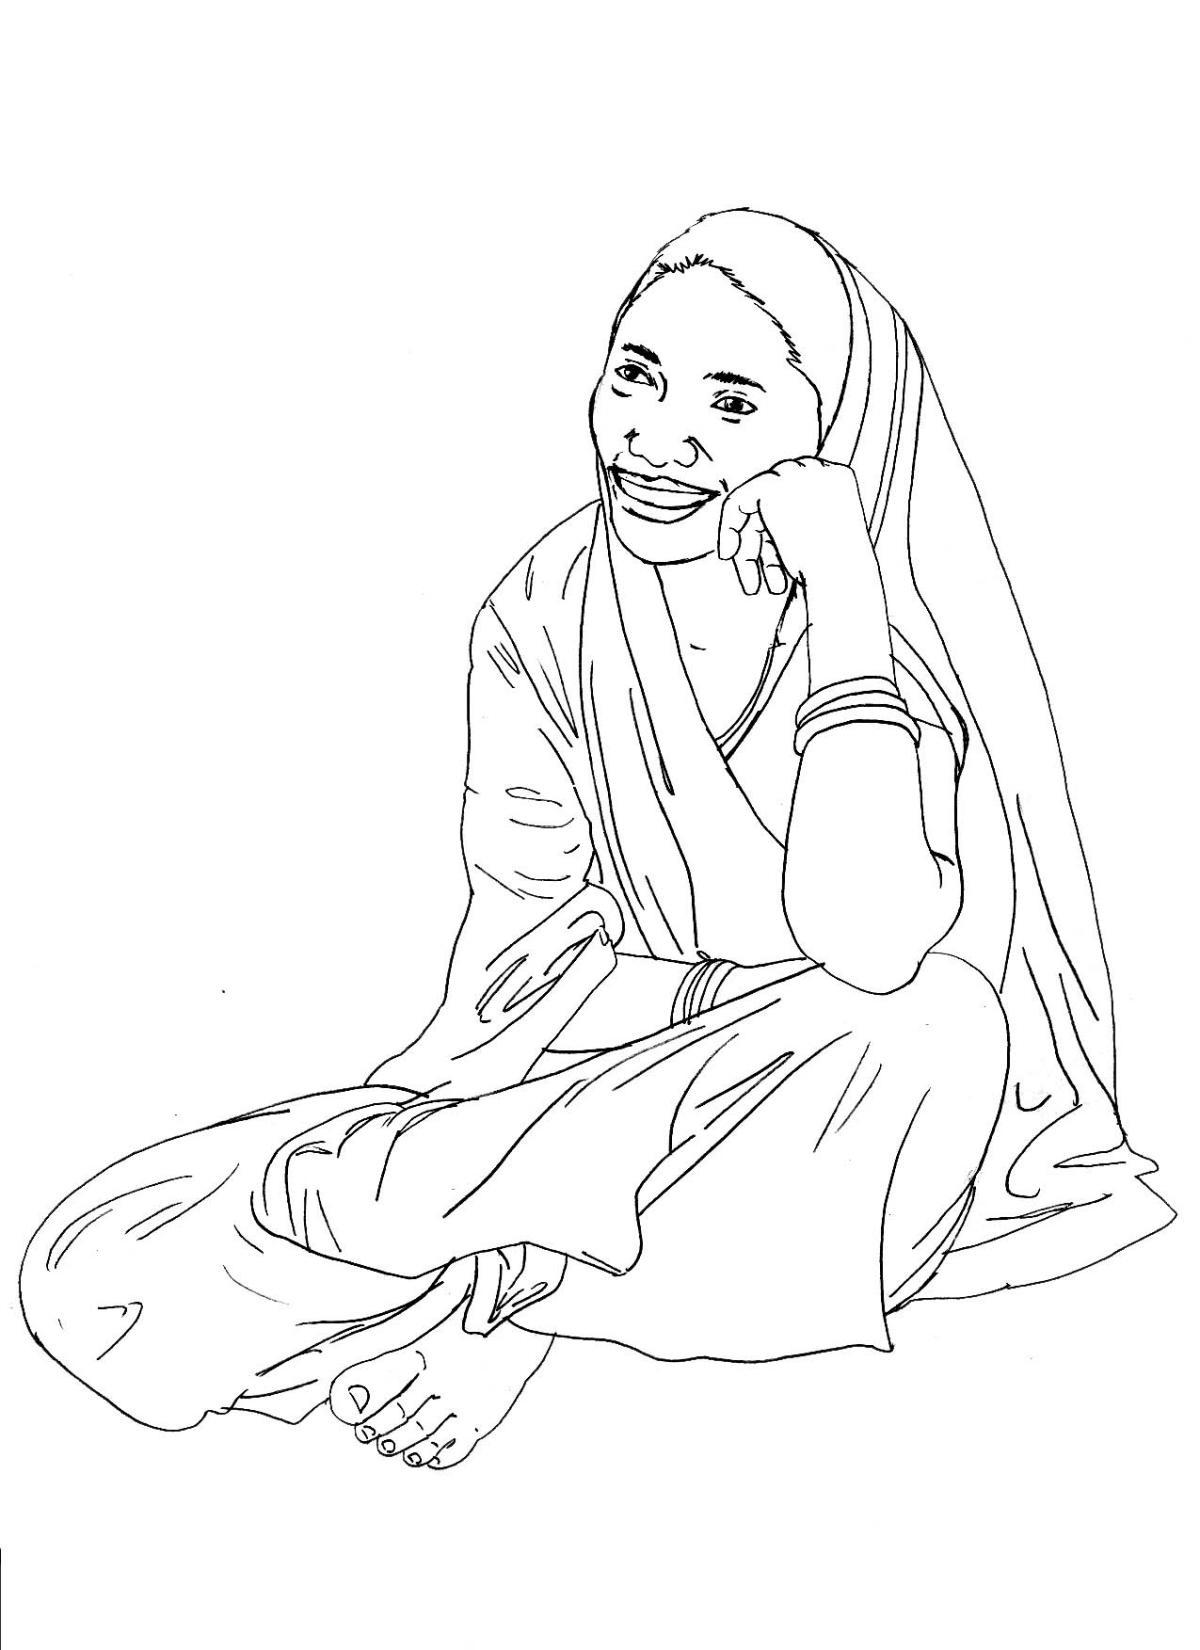 People - Woman sitting - 06 - India